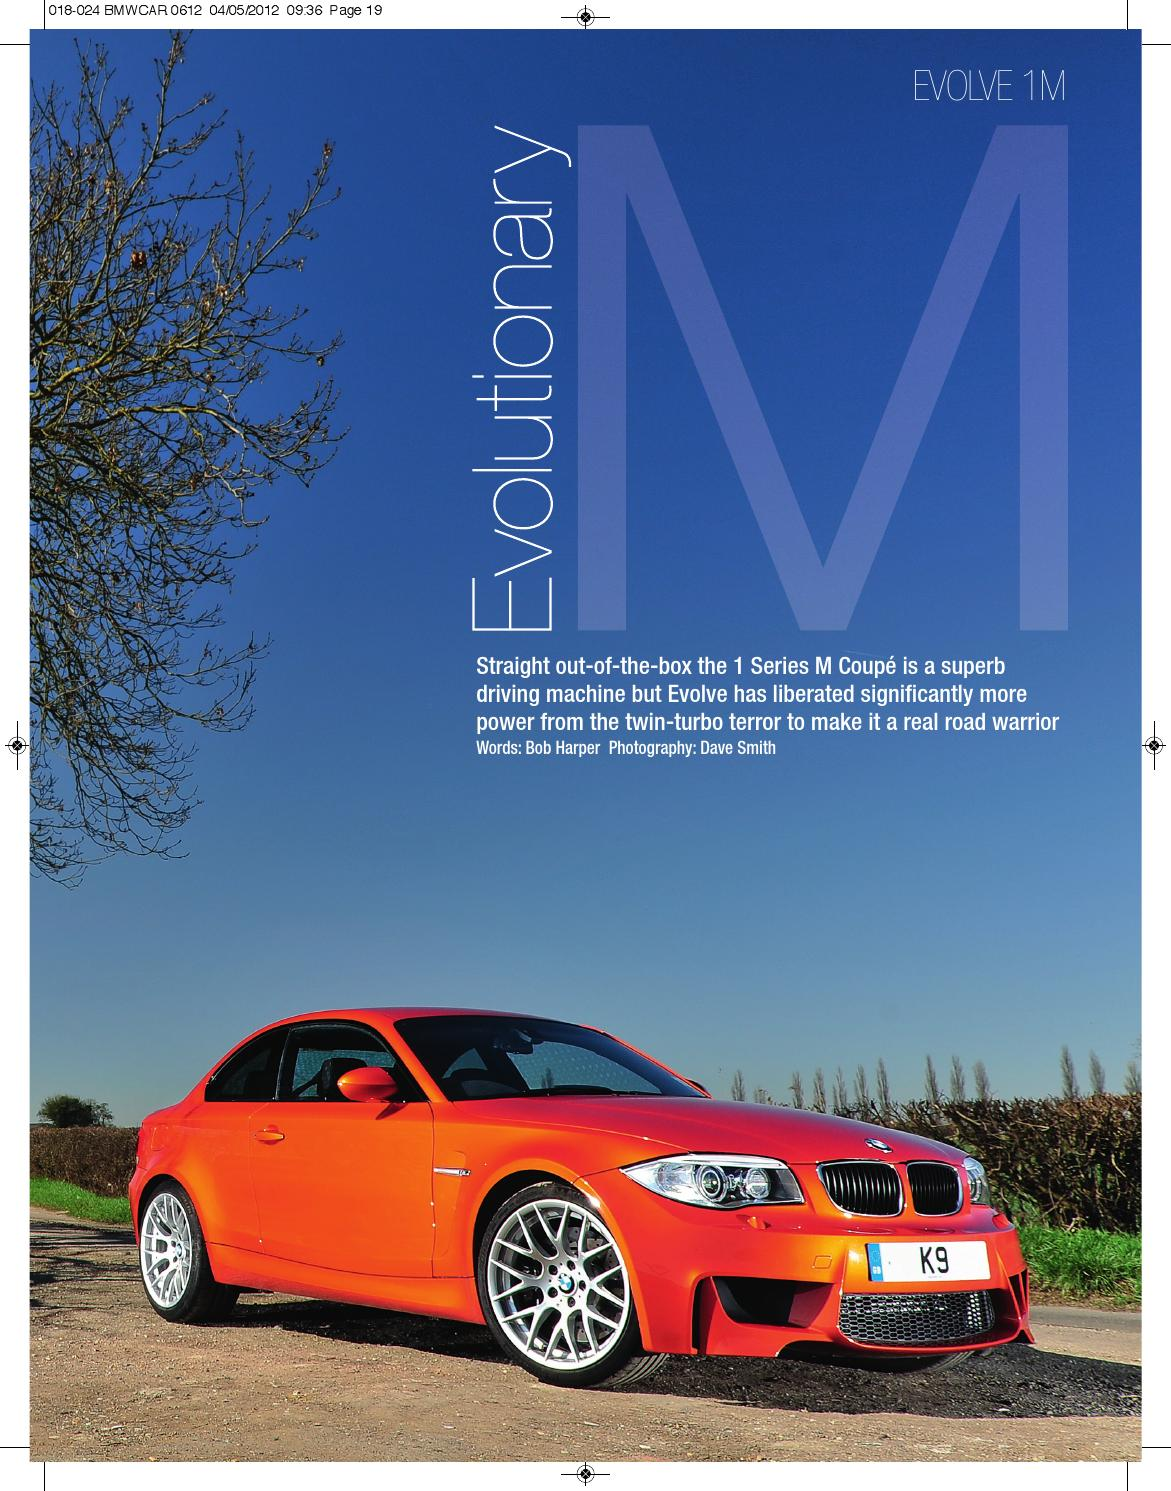 Evolutionary M Evolve 1m By Evolve Automotive Issuu